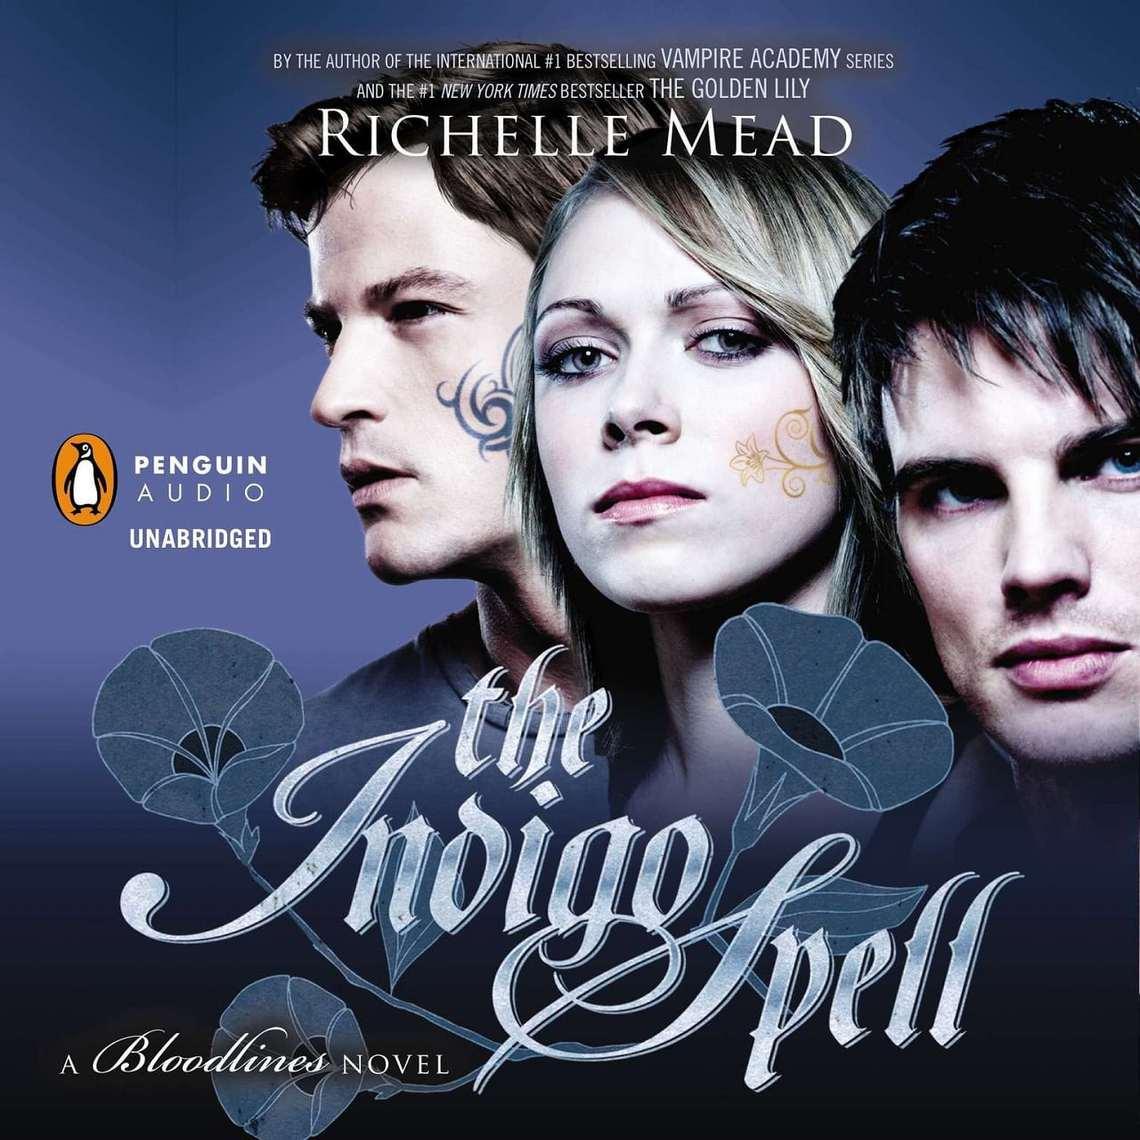 The Indigo Spell Audiobook Free Download